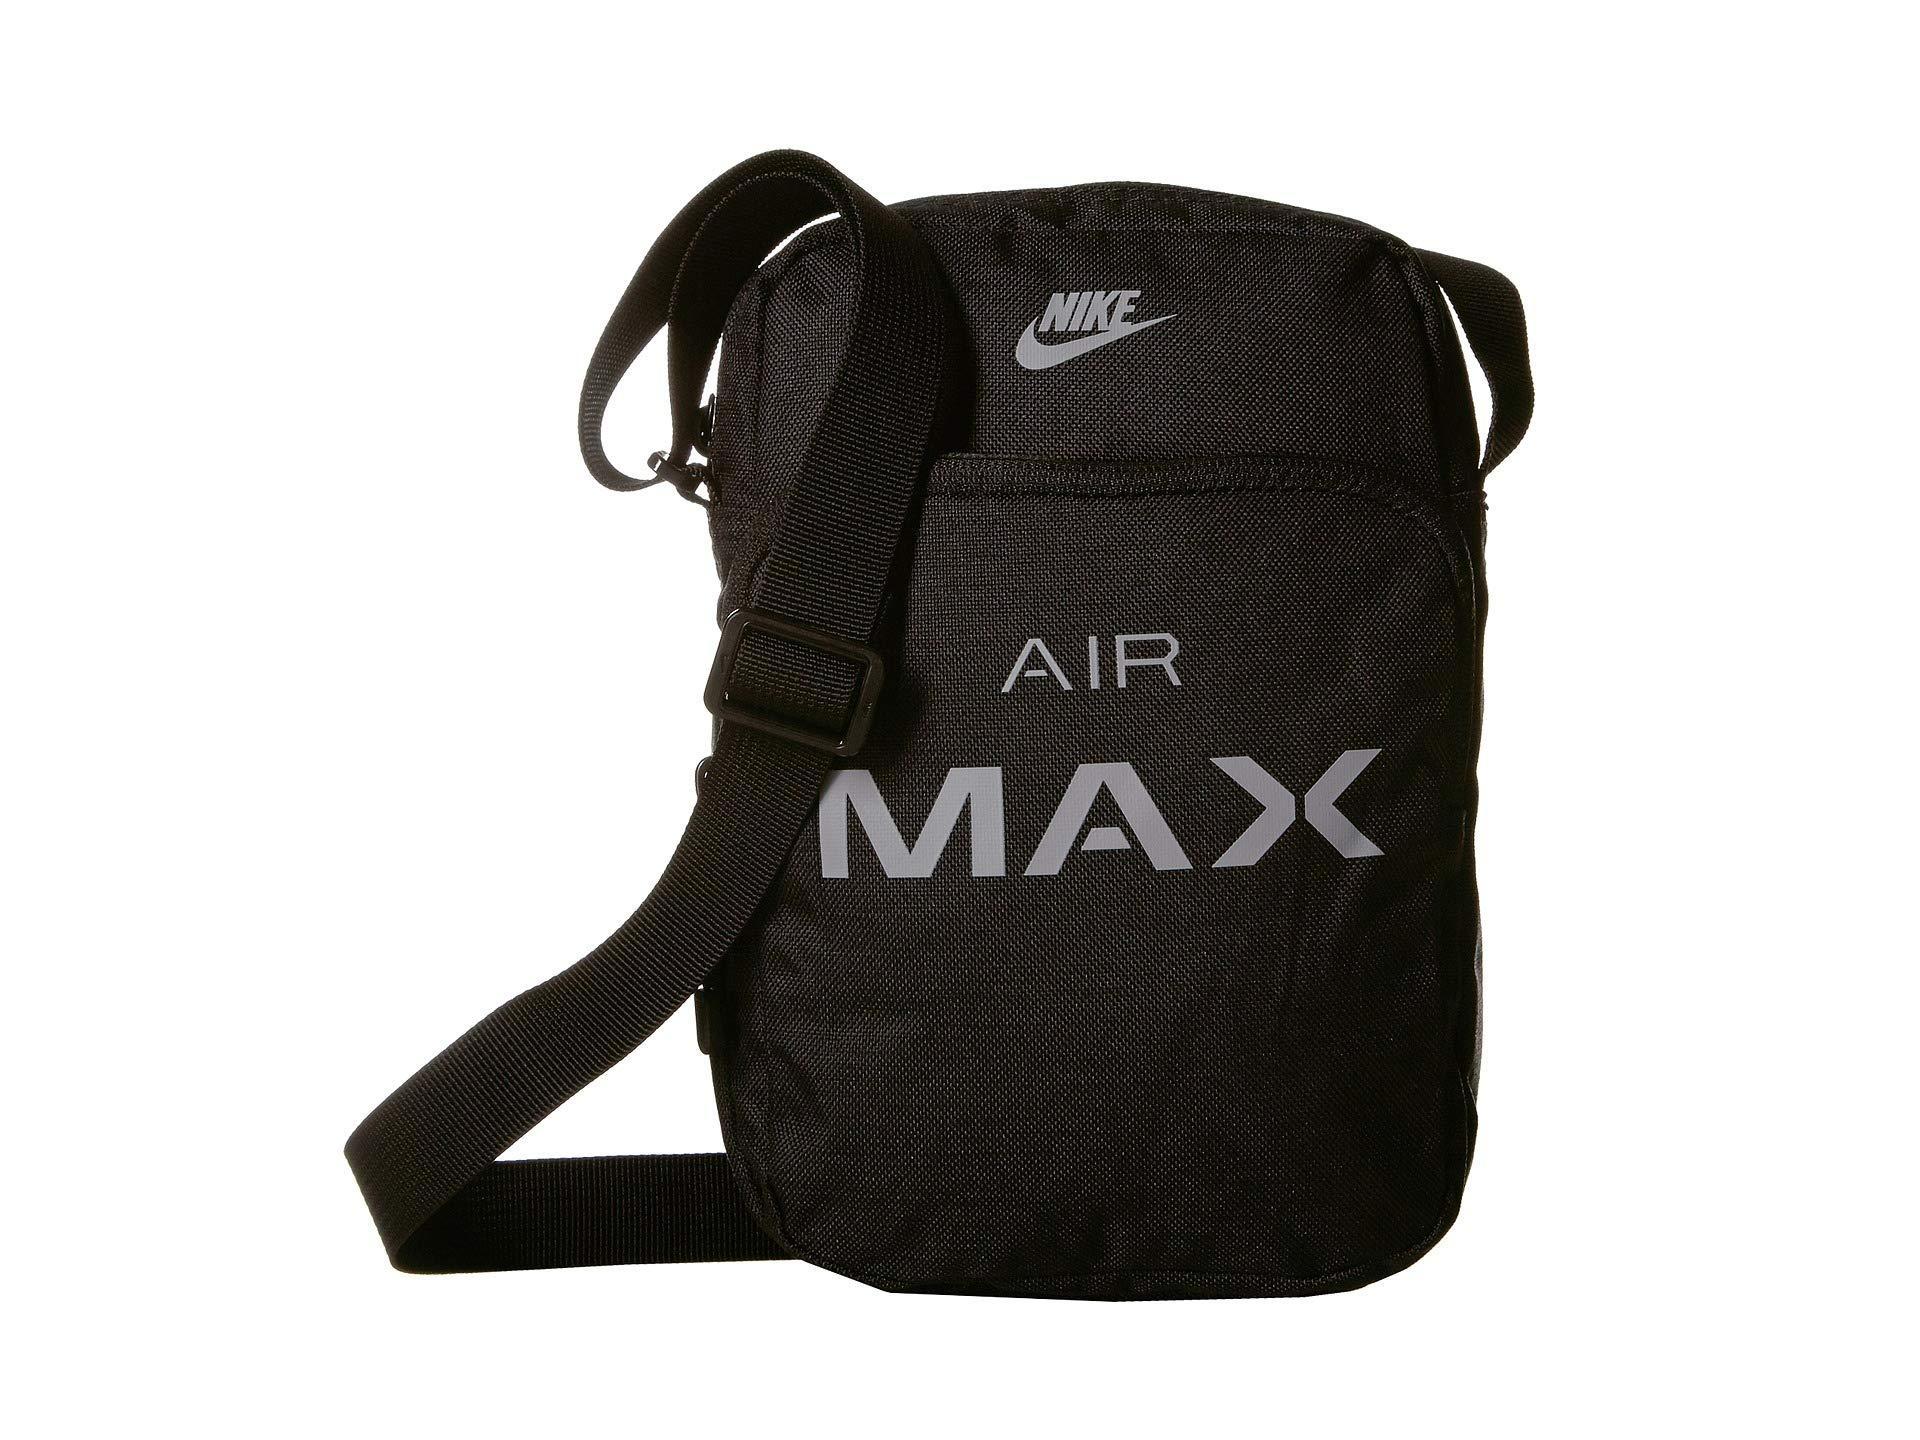 Nike Air Max Small Items Bag Light Bone Black Campfire Orange Cross Body Handbags